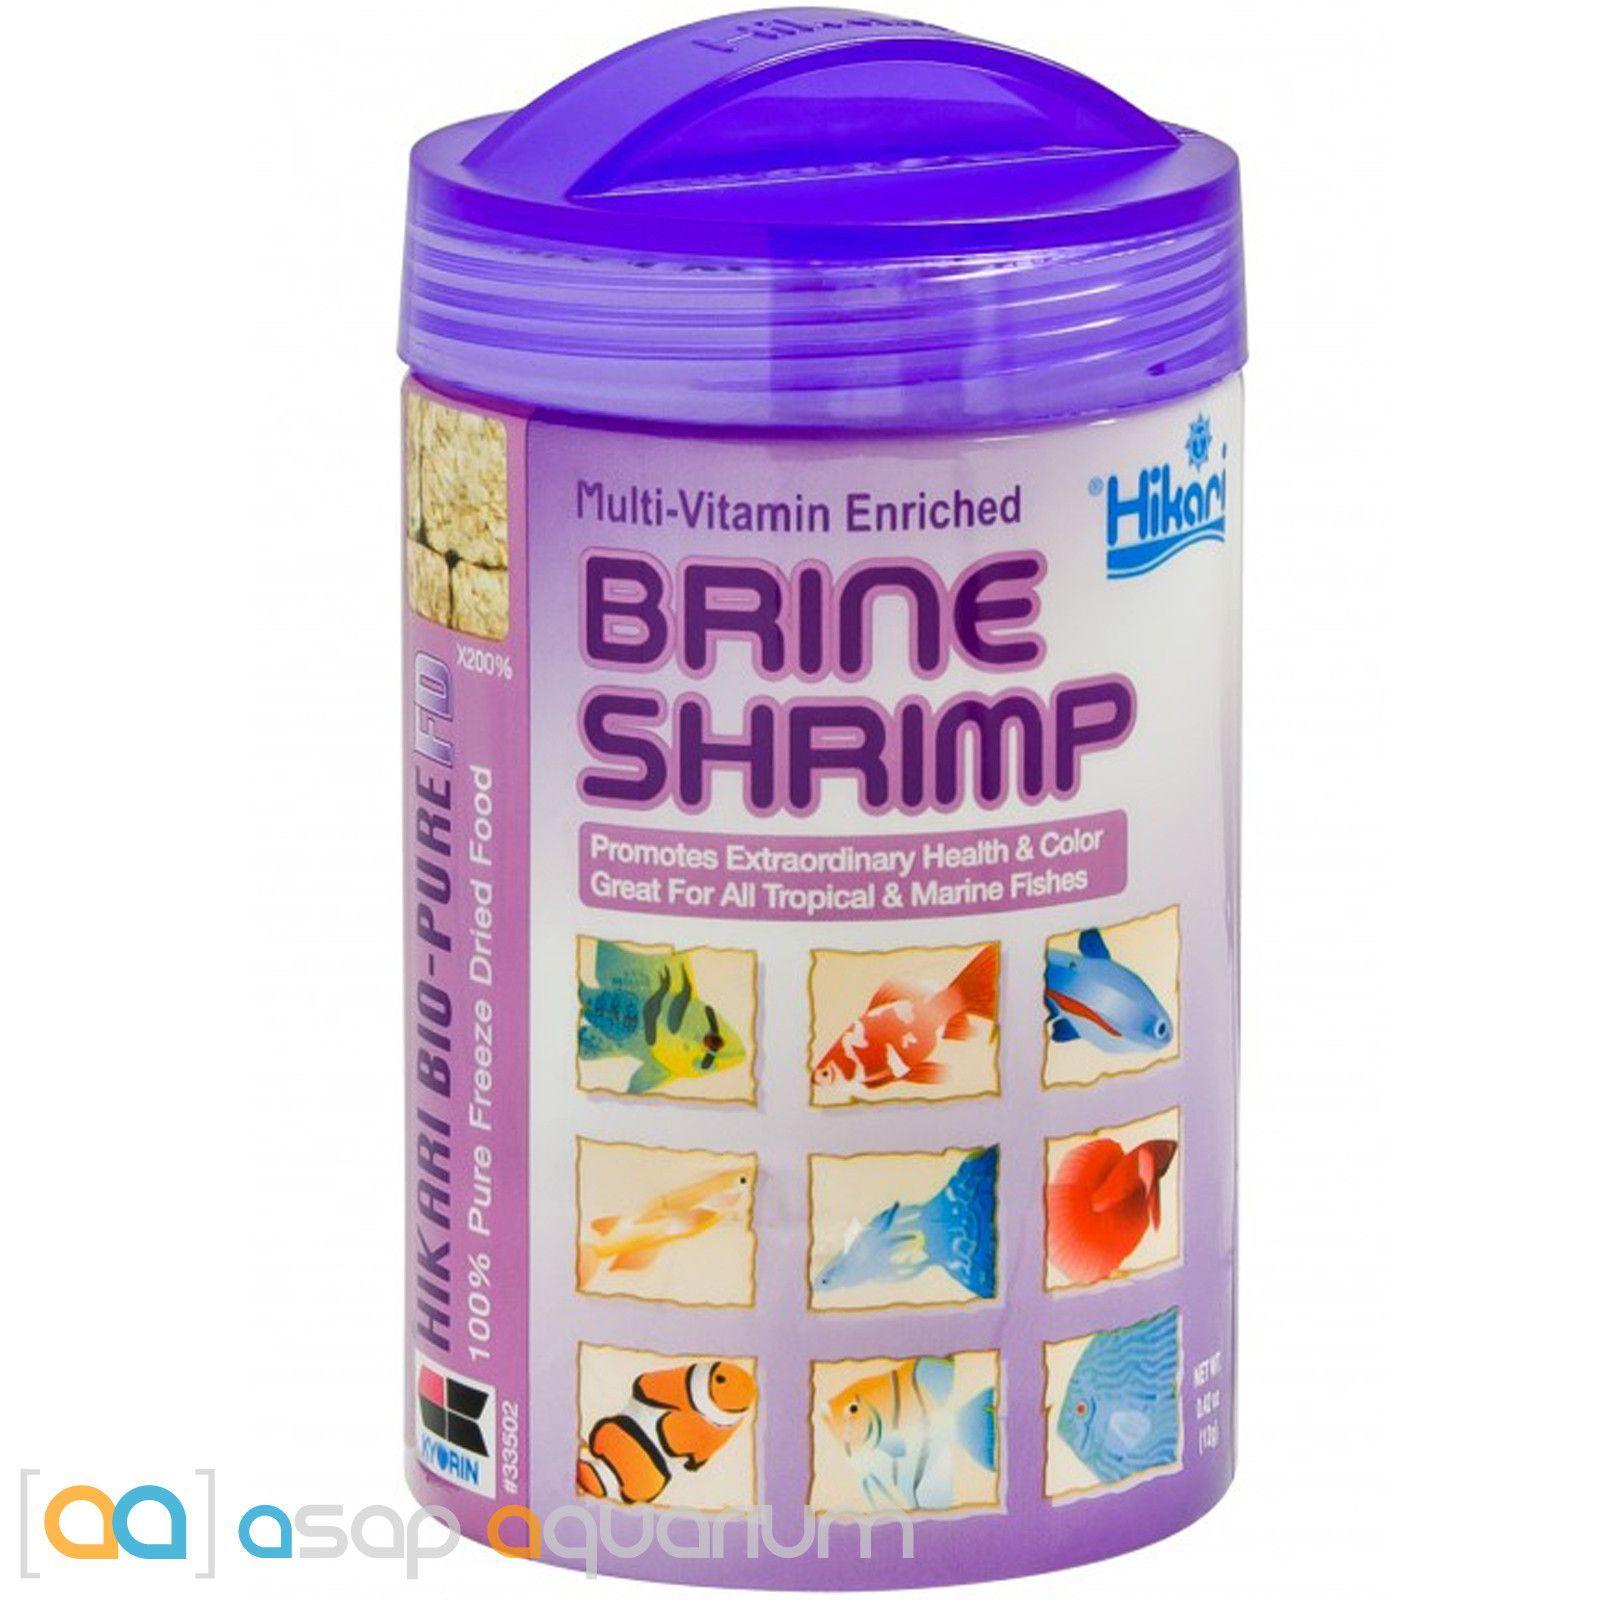 Hikari BioPure Freeze Dried Brine Shrimp (0.42 oz